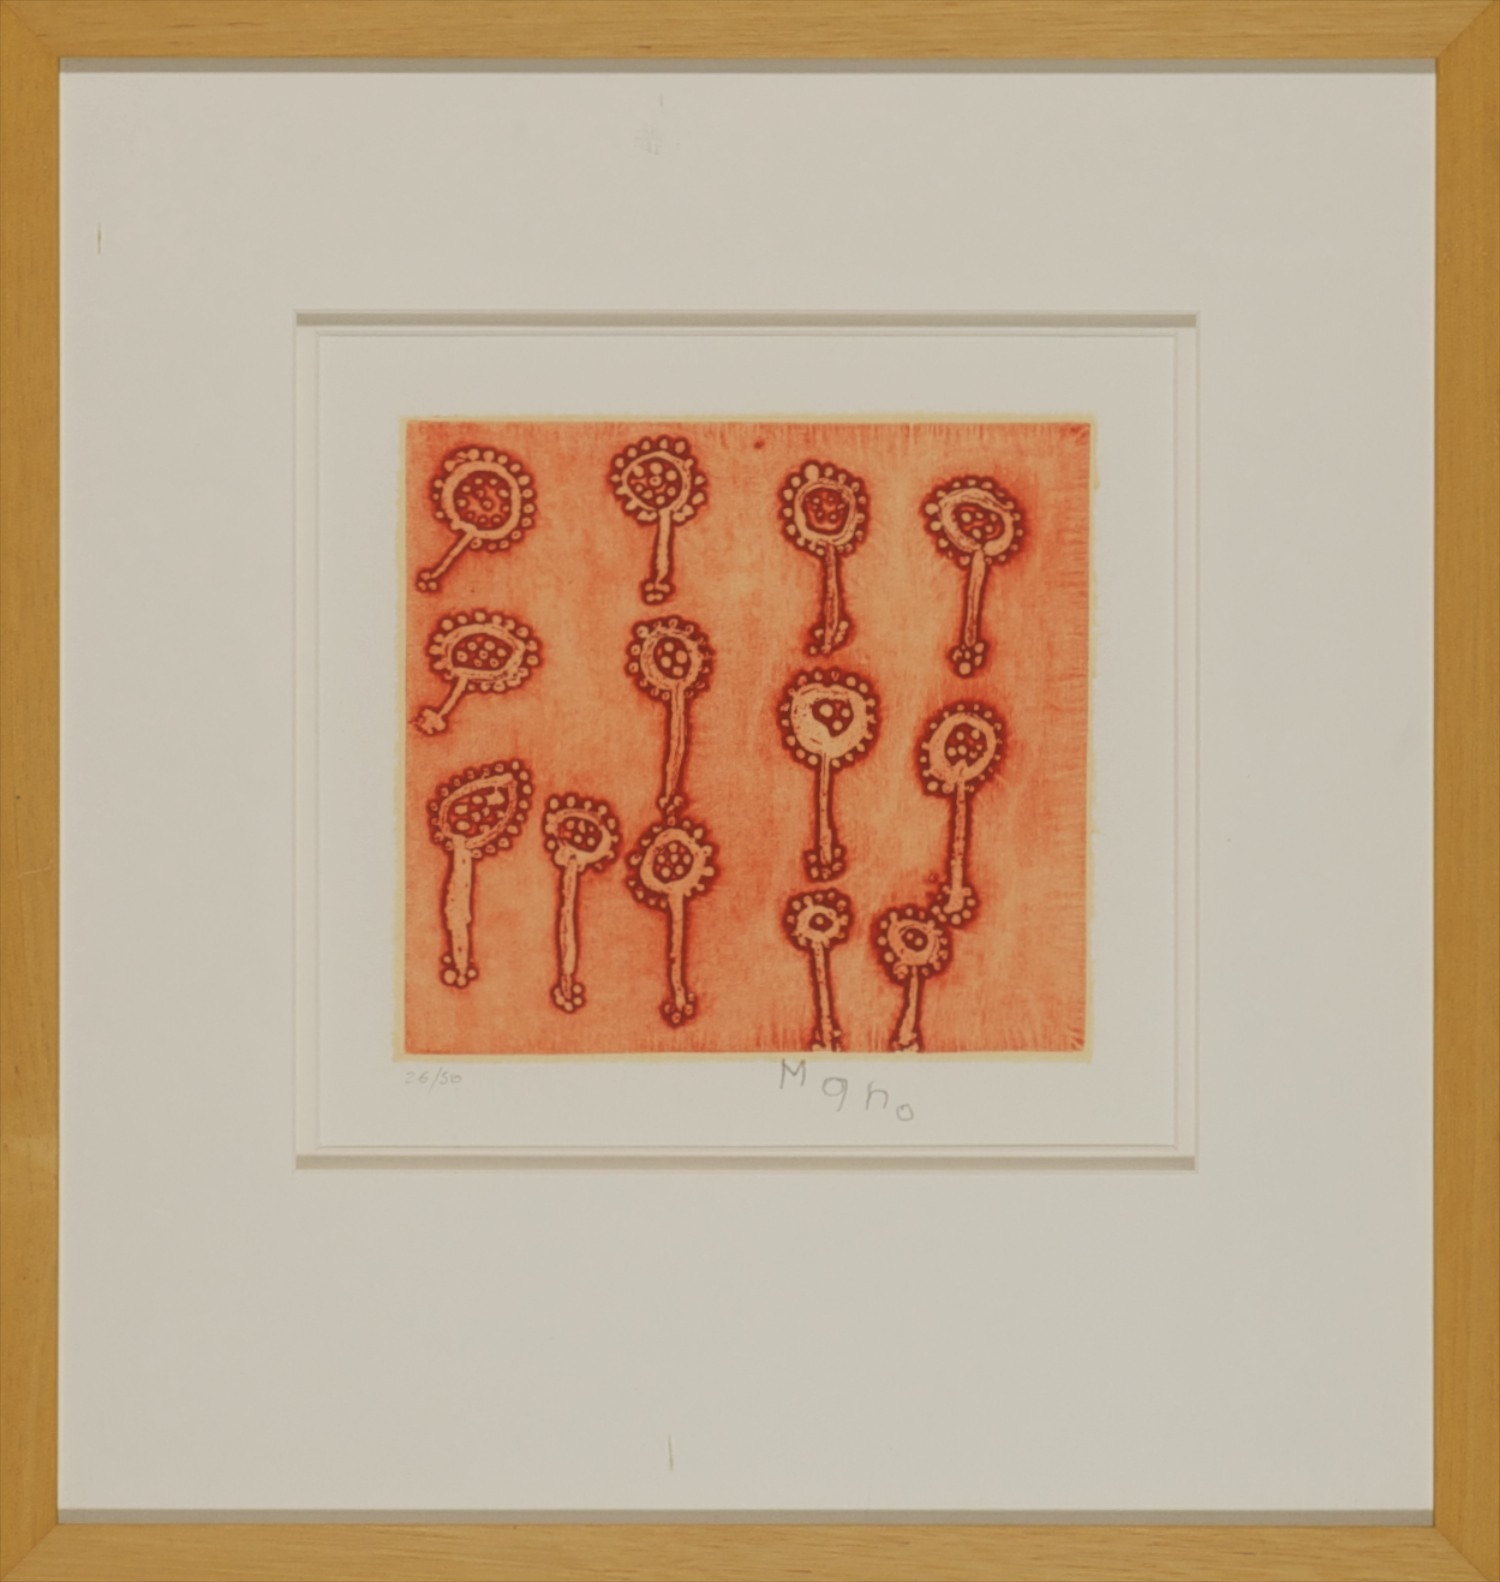 #4285. Mercier Wawul. Minnie Mindi (Lotus Pods) Etching 26-50. 46cm x 44cm. Was $695 Now $347.50